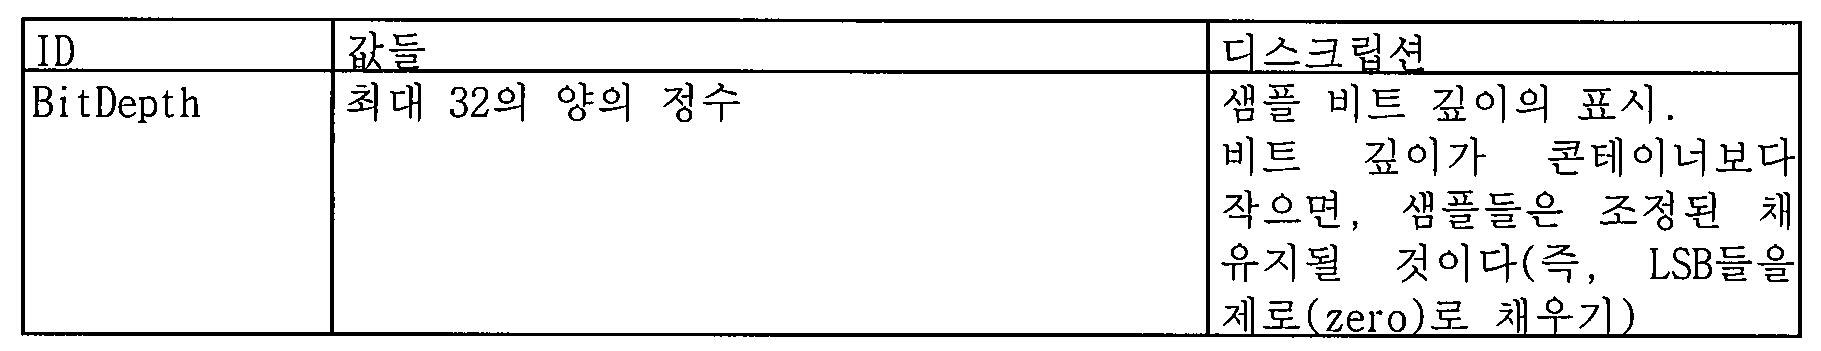 Figure 112014128070760-pat00006